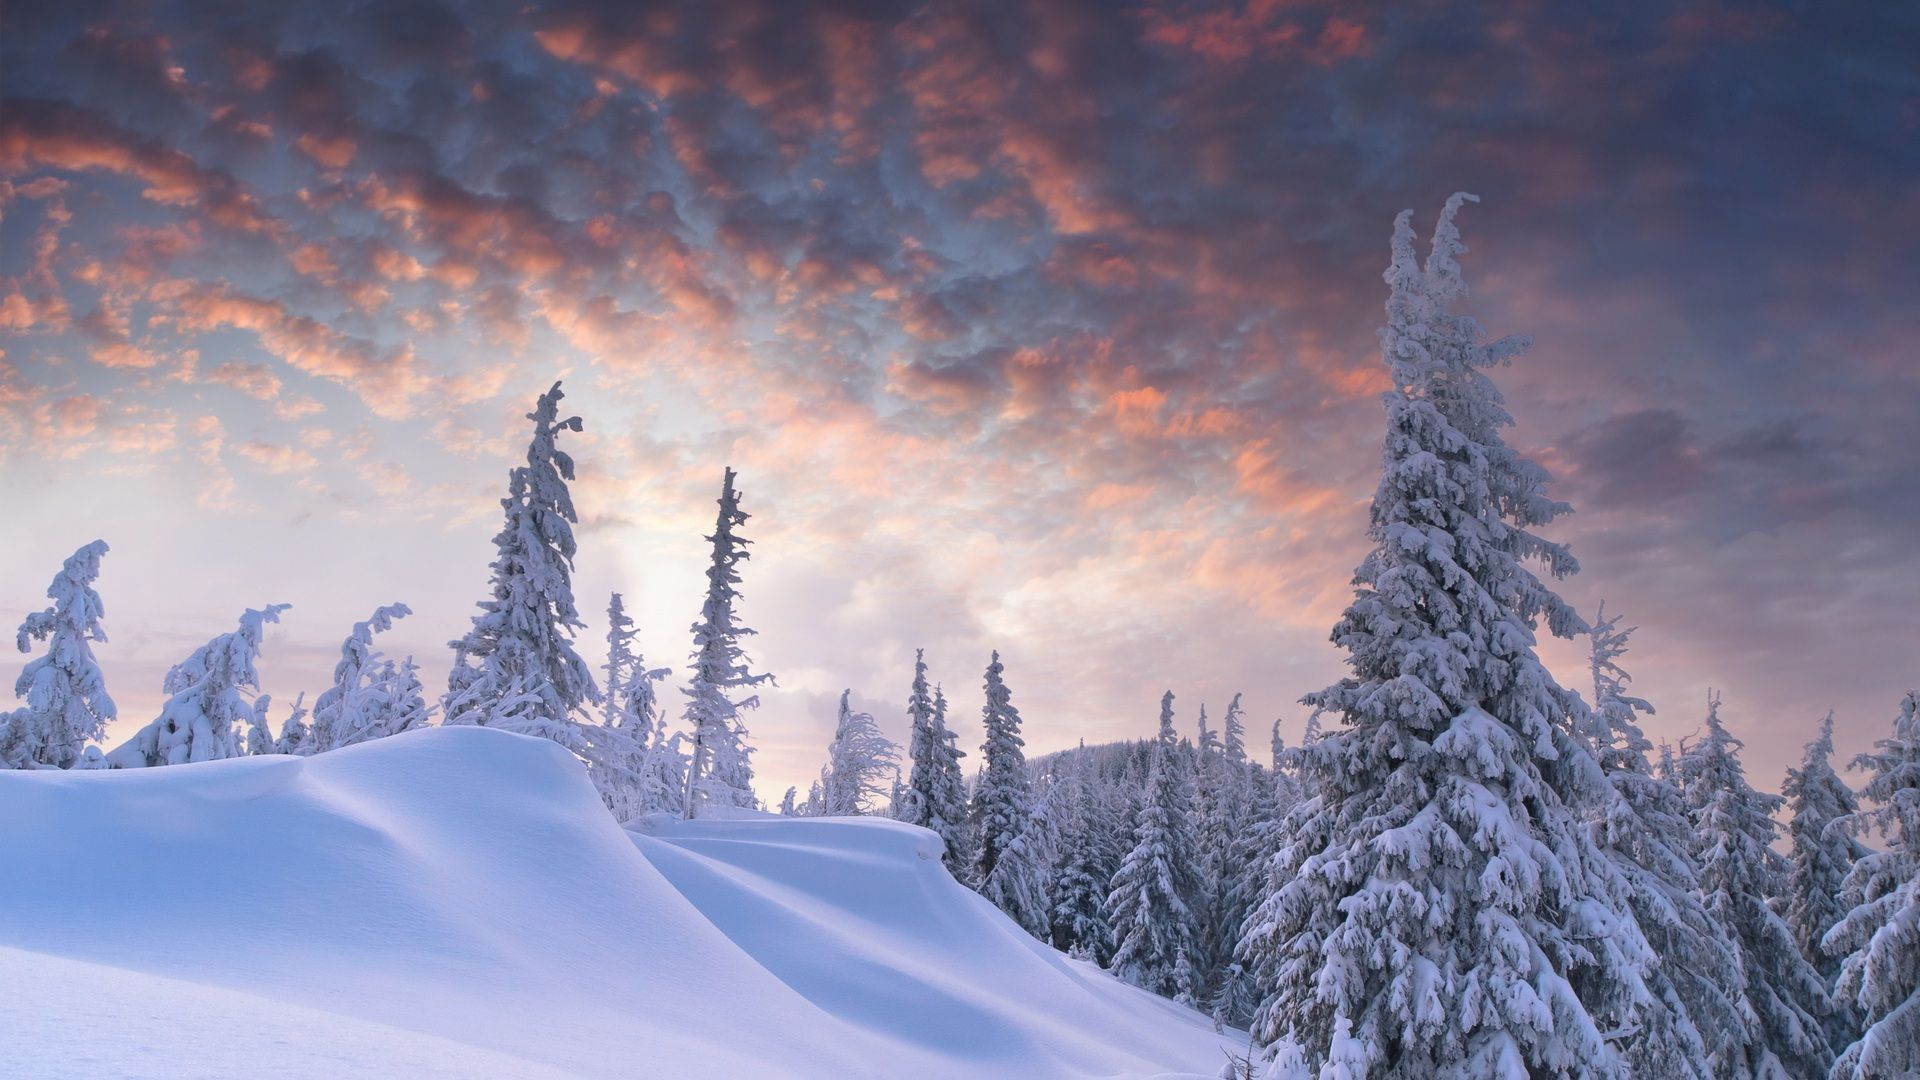 27 Nature Aesthetic Winter Desktop Wallpaper Basty Wallpaper